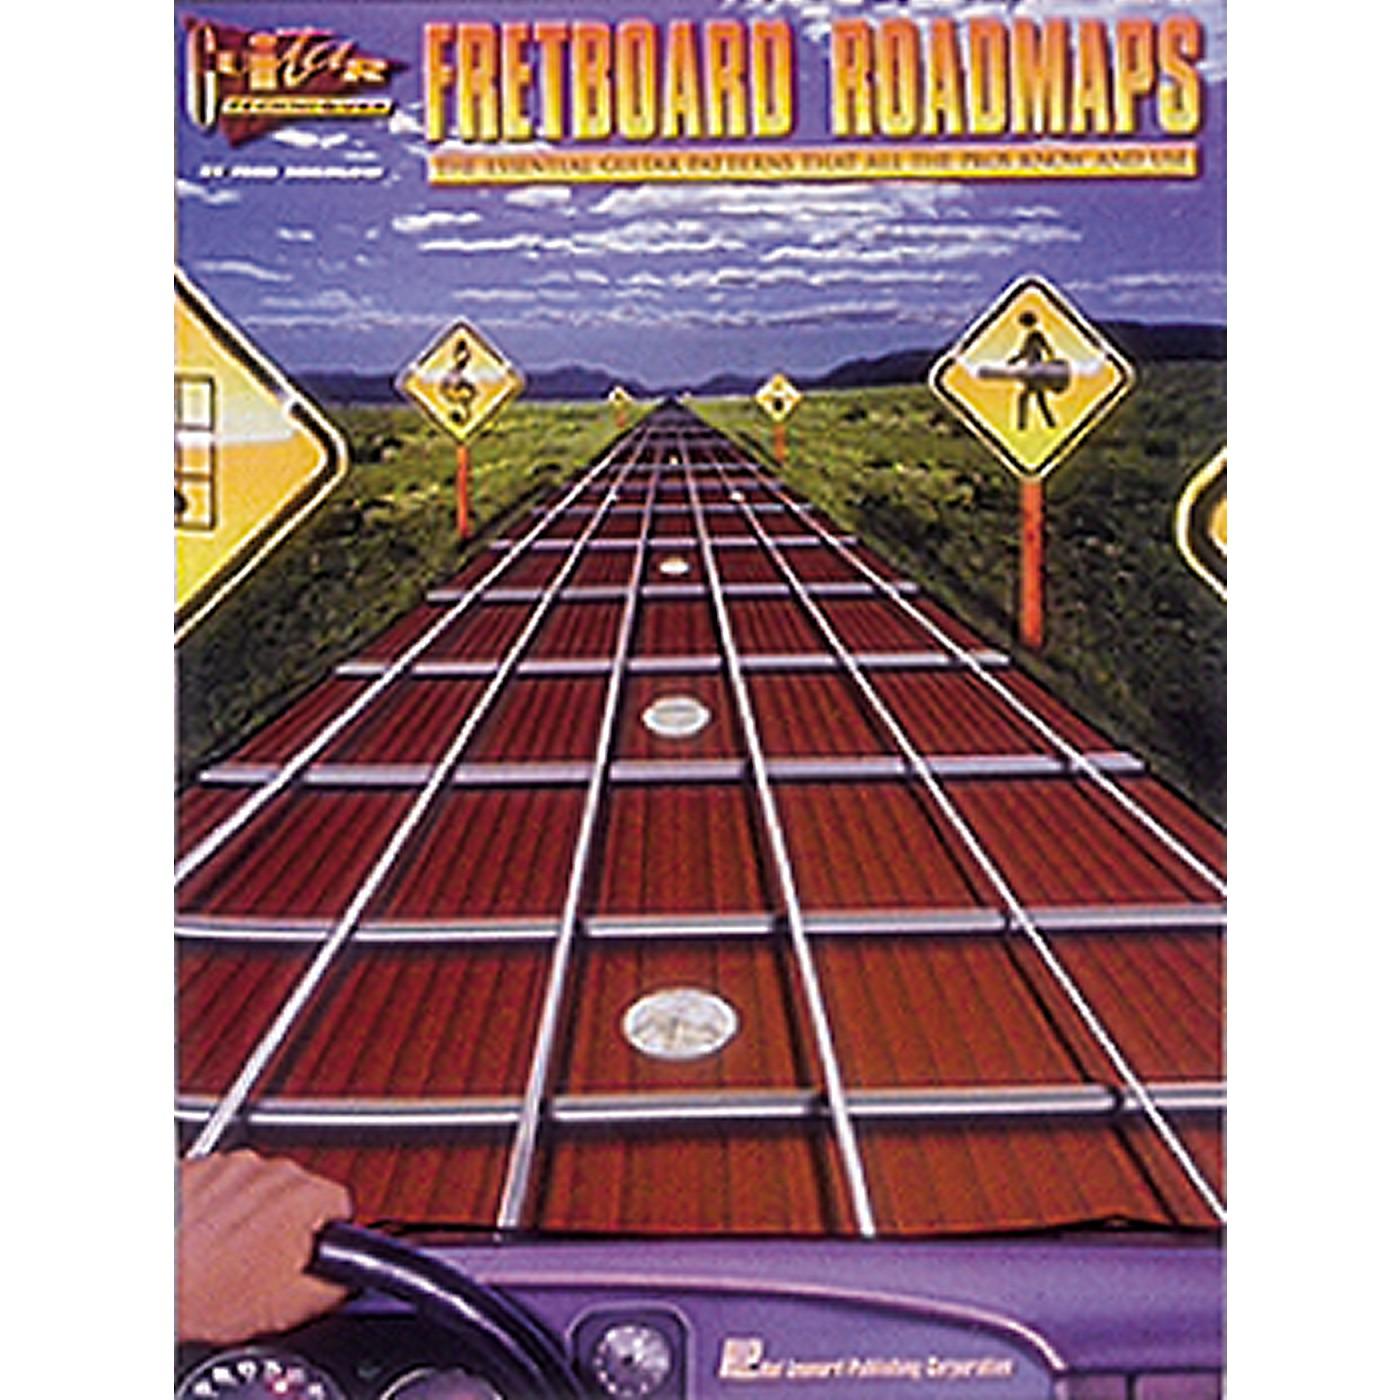 Hal Leonard Guitar Techniques Book - Fretboard Roadmaps thumbnail